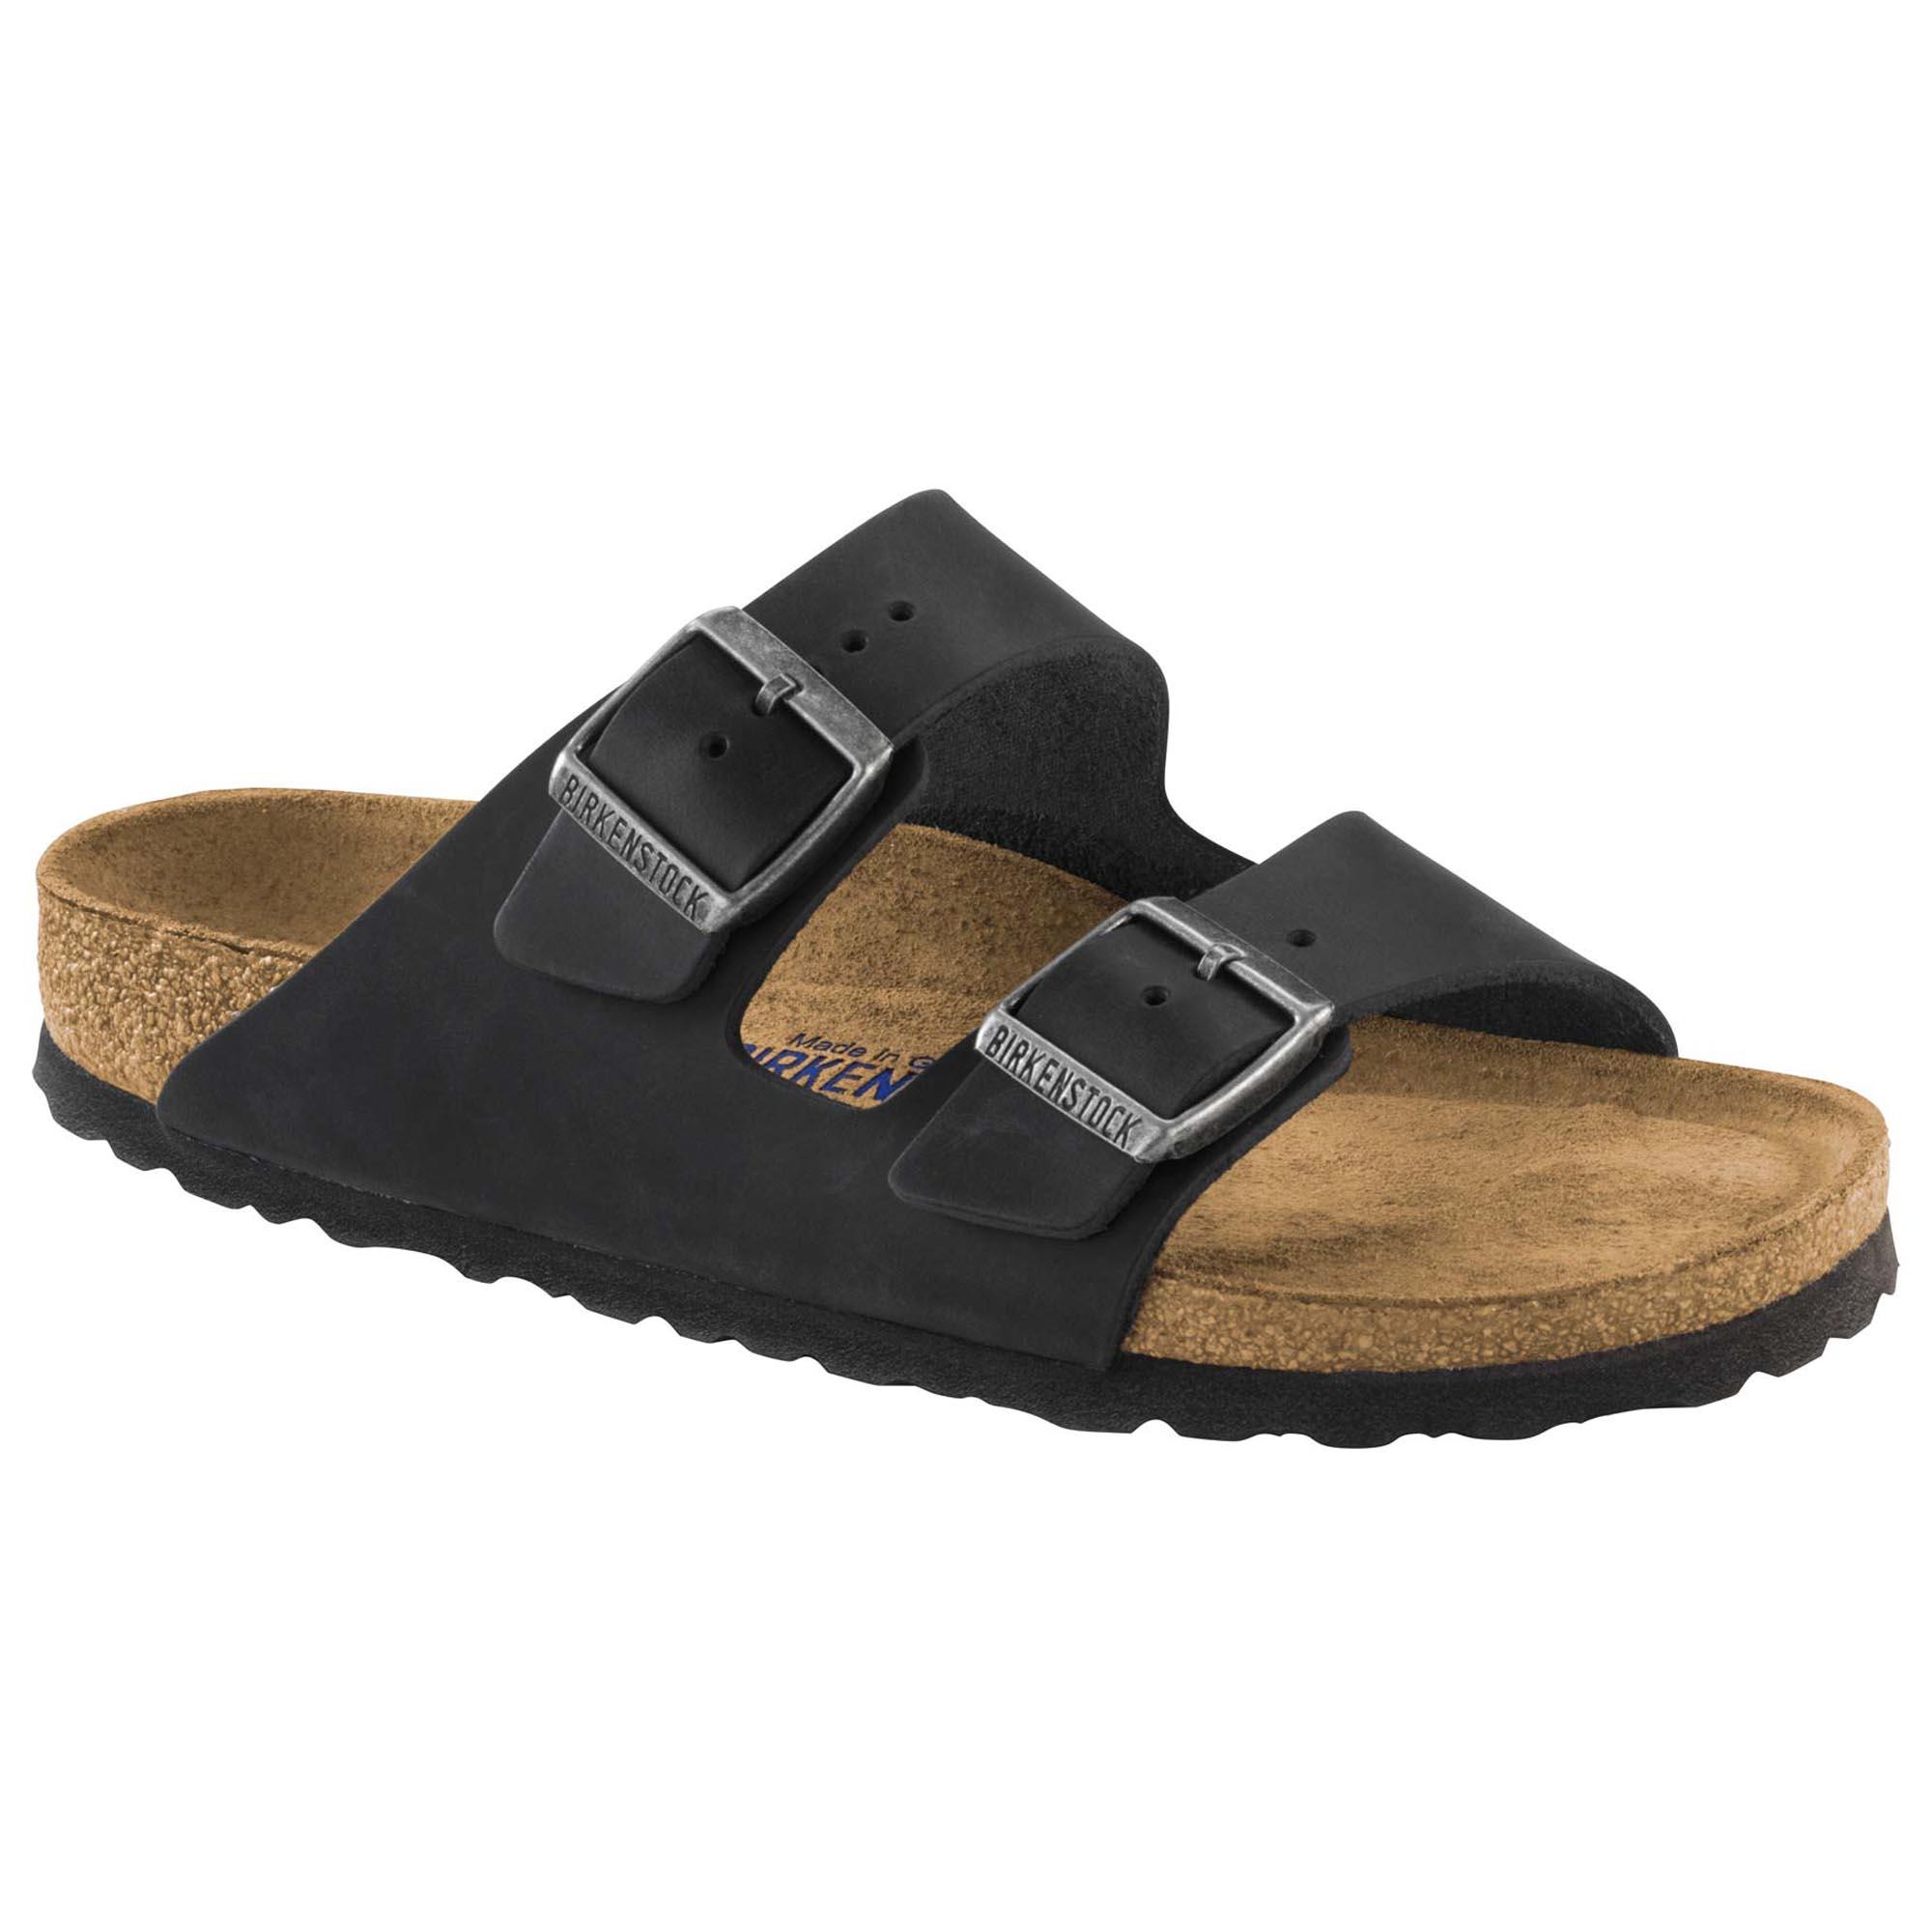 0d6868f1cfae Arizona Nubuck Leather Black | shop online at BIRKENSTOCK